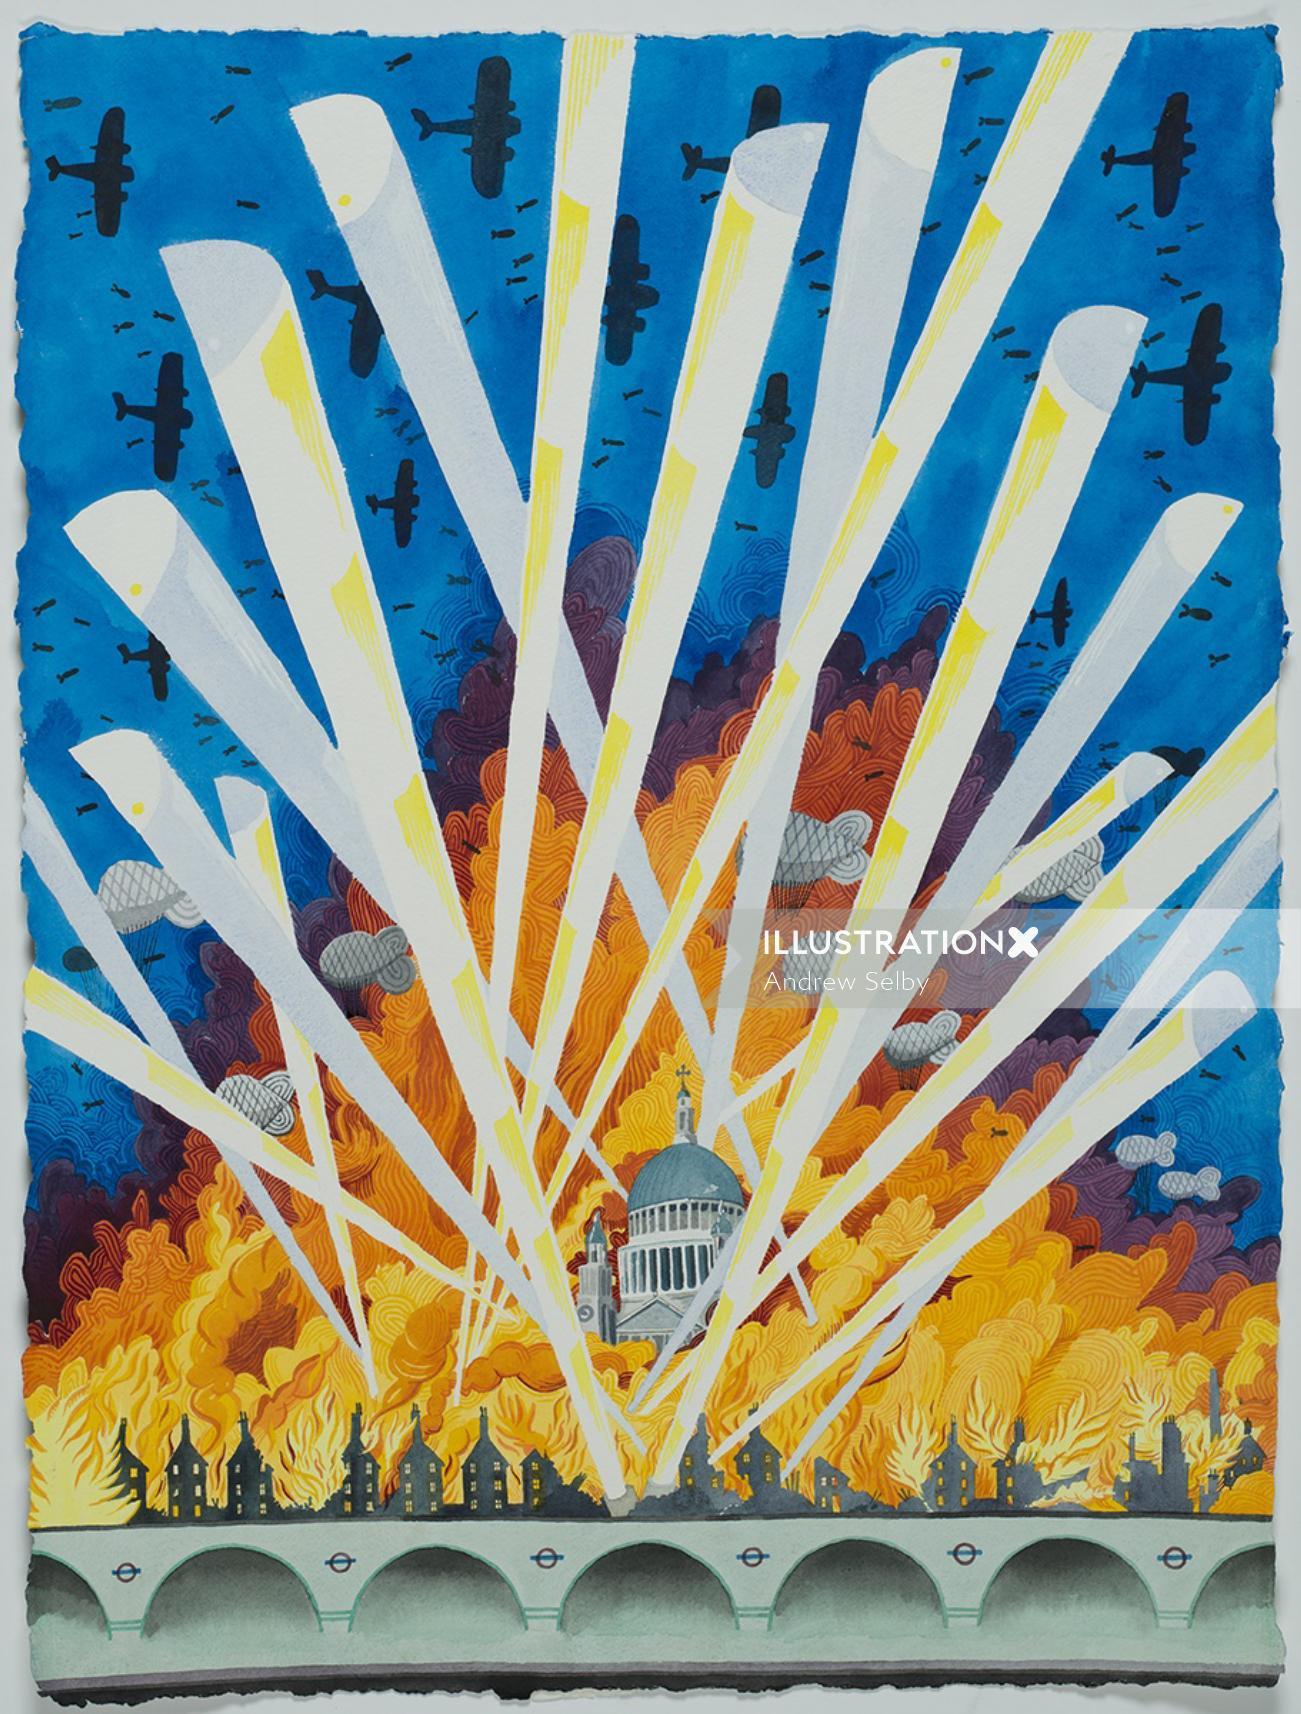 Aeroplanes bombing London city